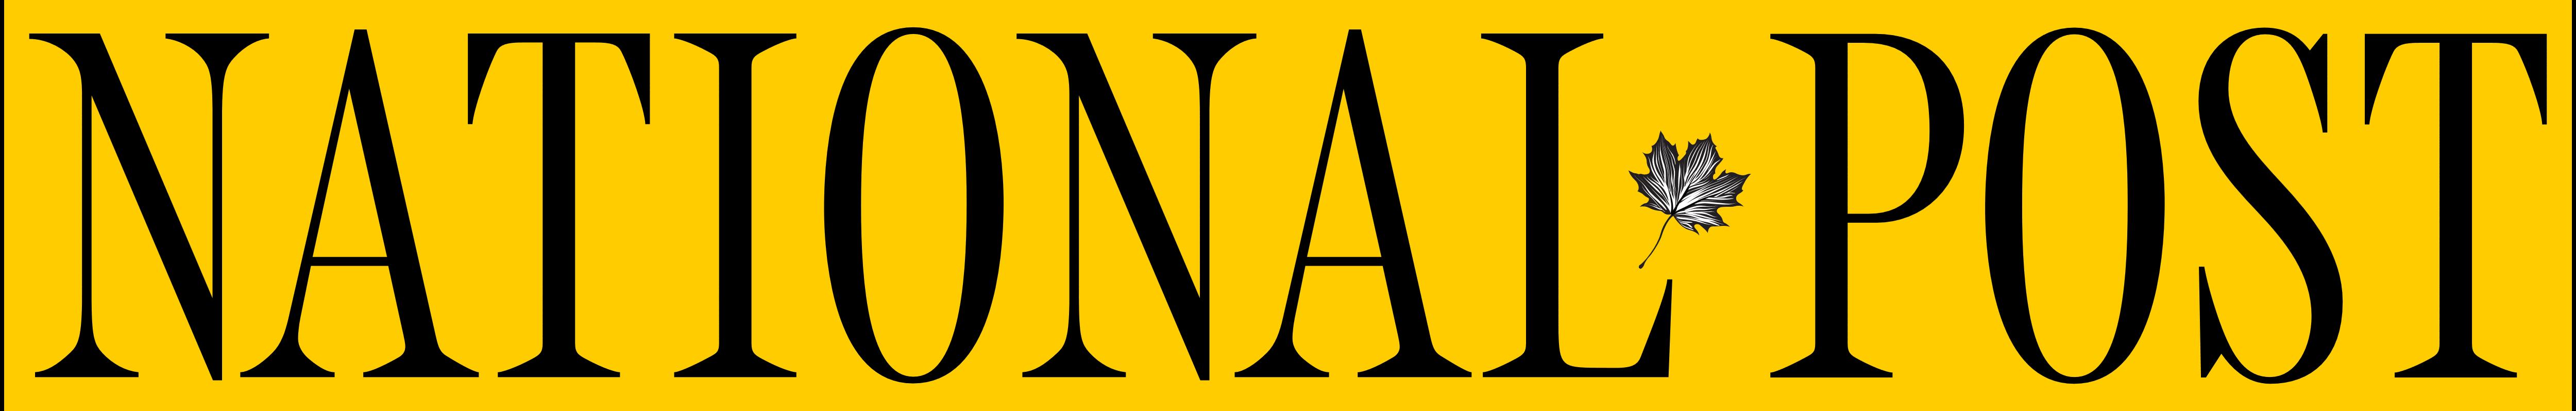 National Post - Logos Download